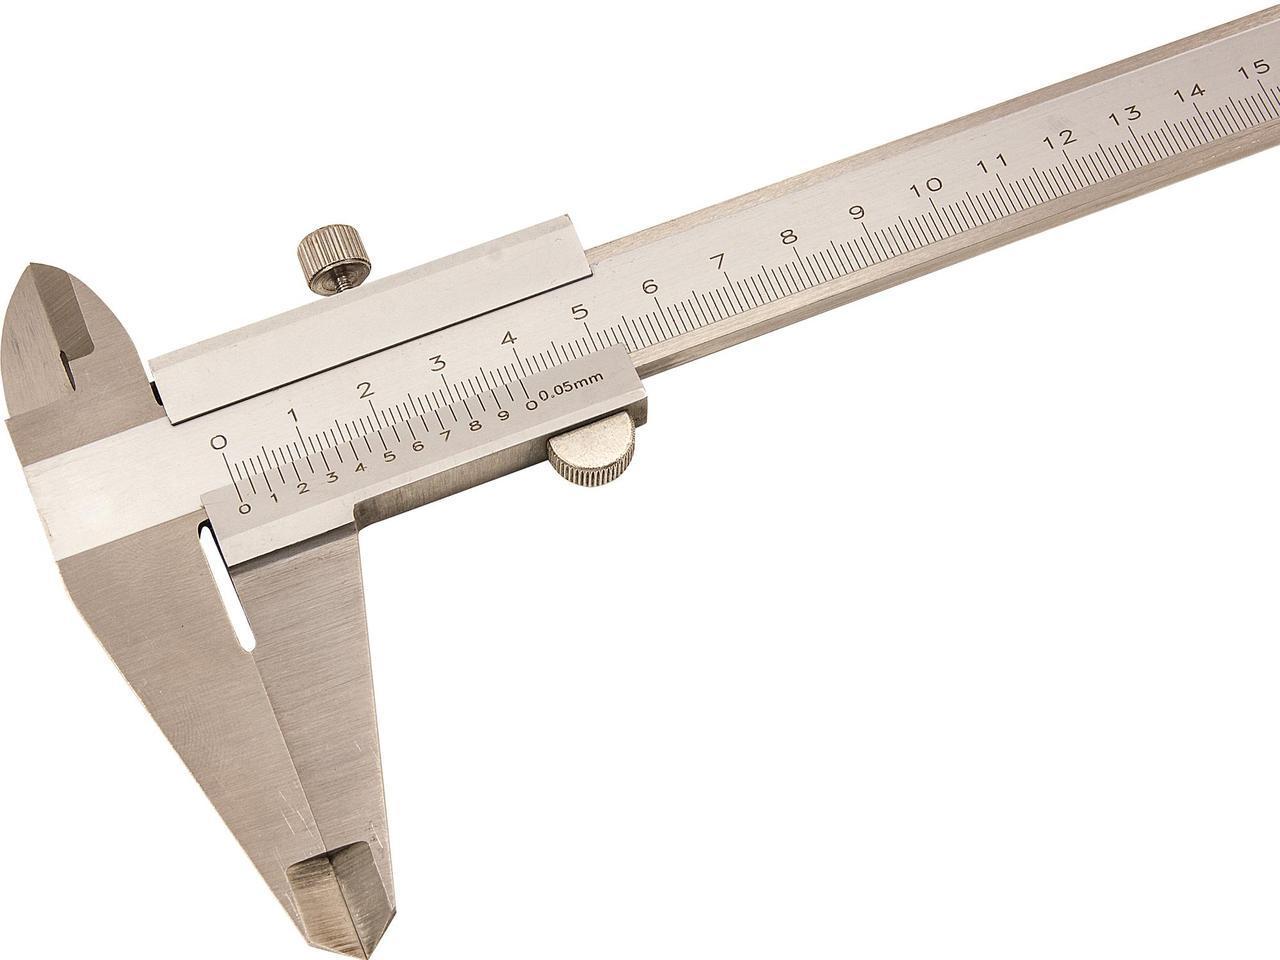 Штангенциркуль ШЦ-II 0-500 0.05 Эталон губки 100мм